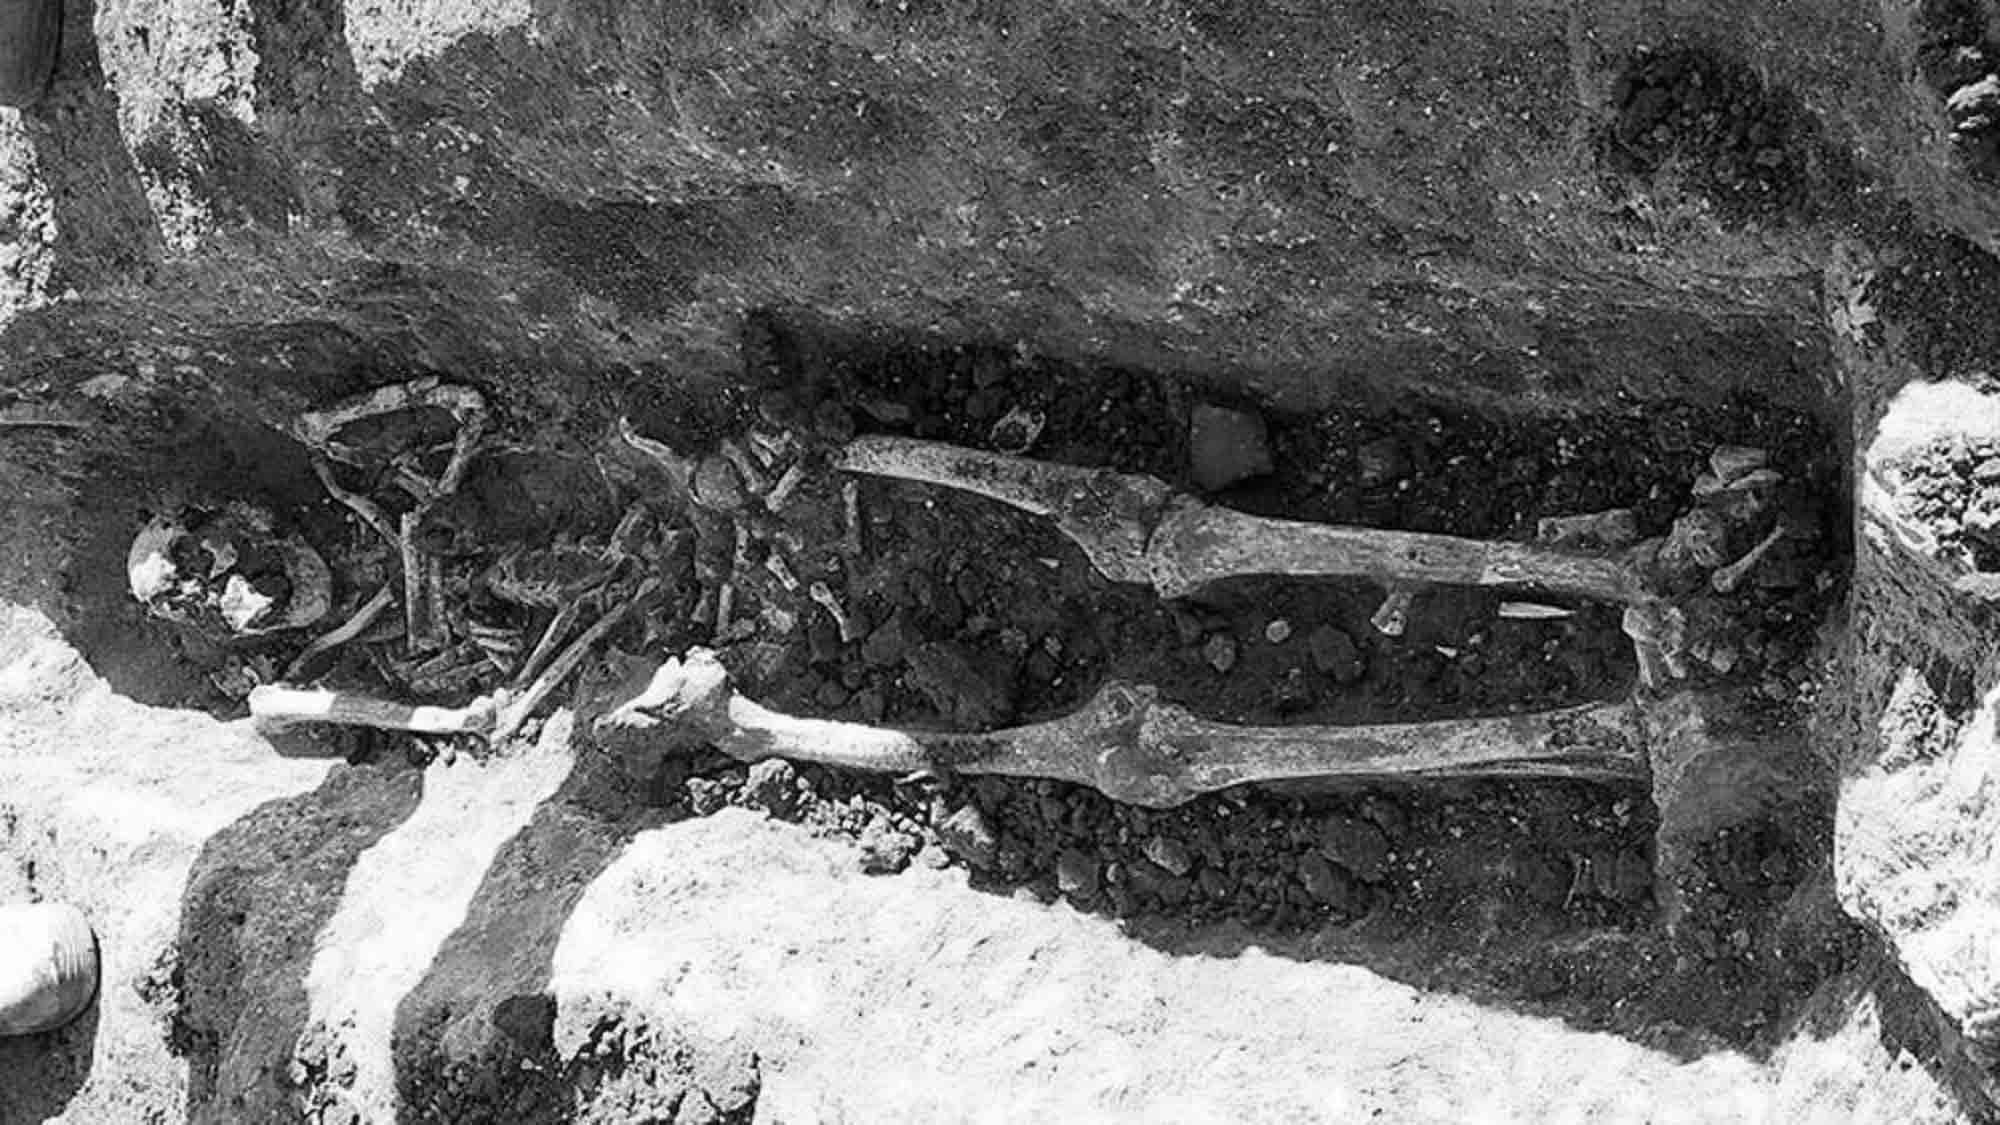 Roman Necropolis With 30 Perfect Graves Found